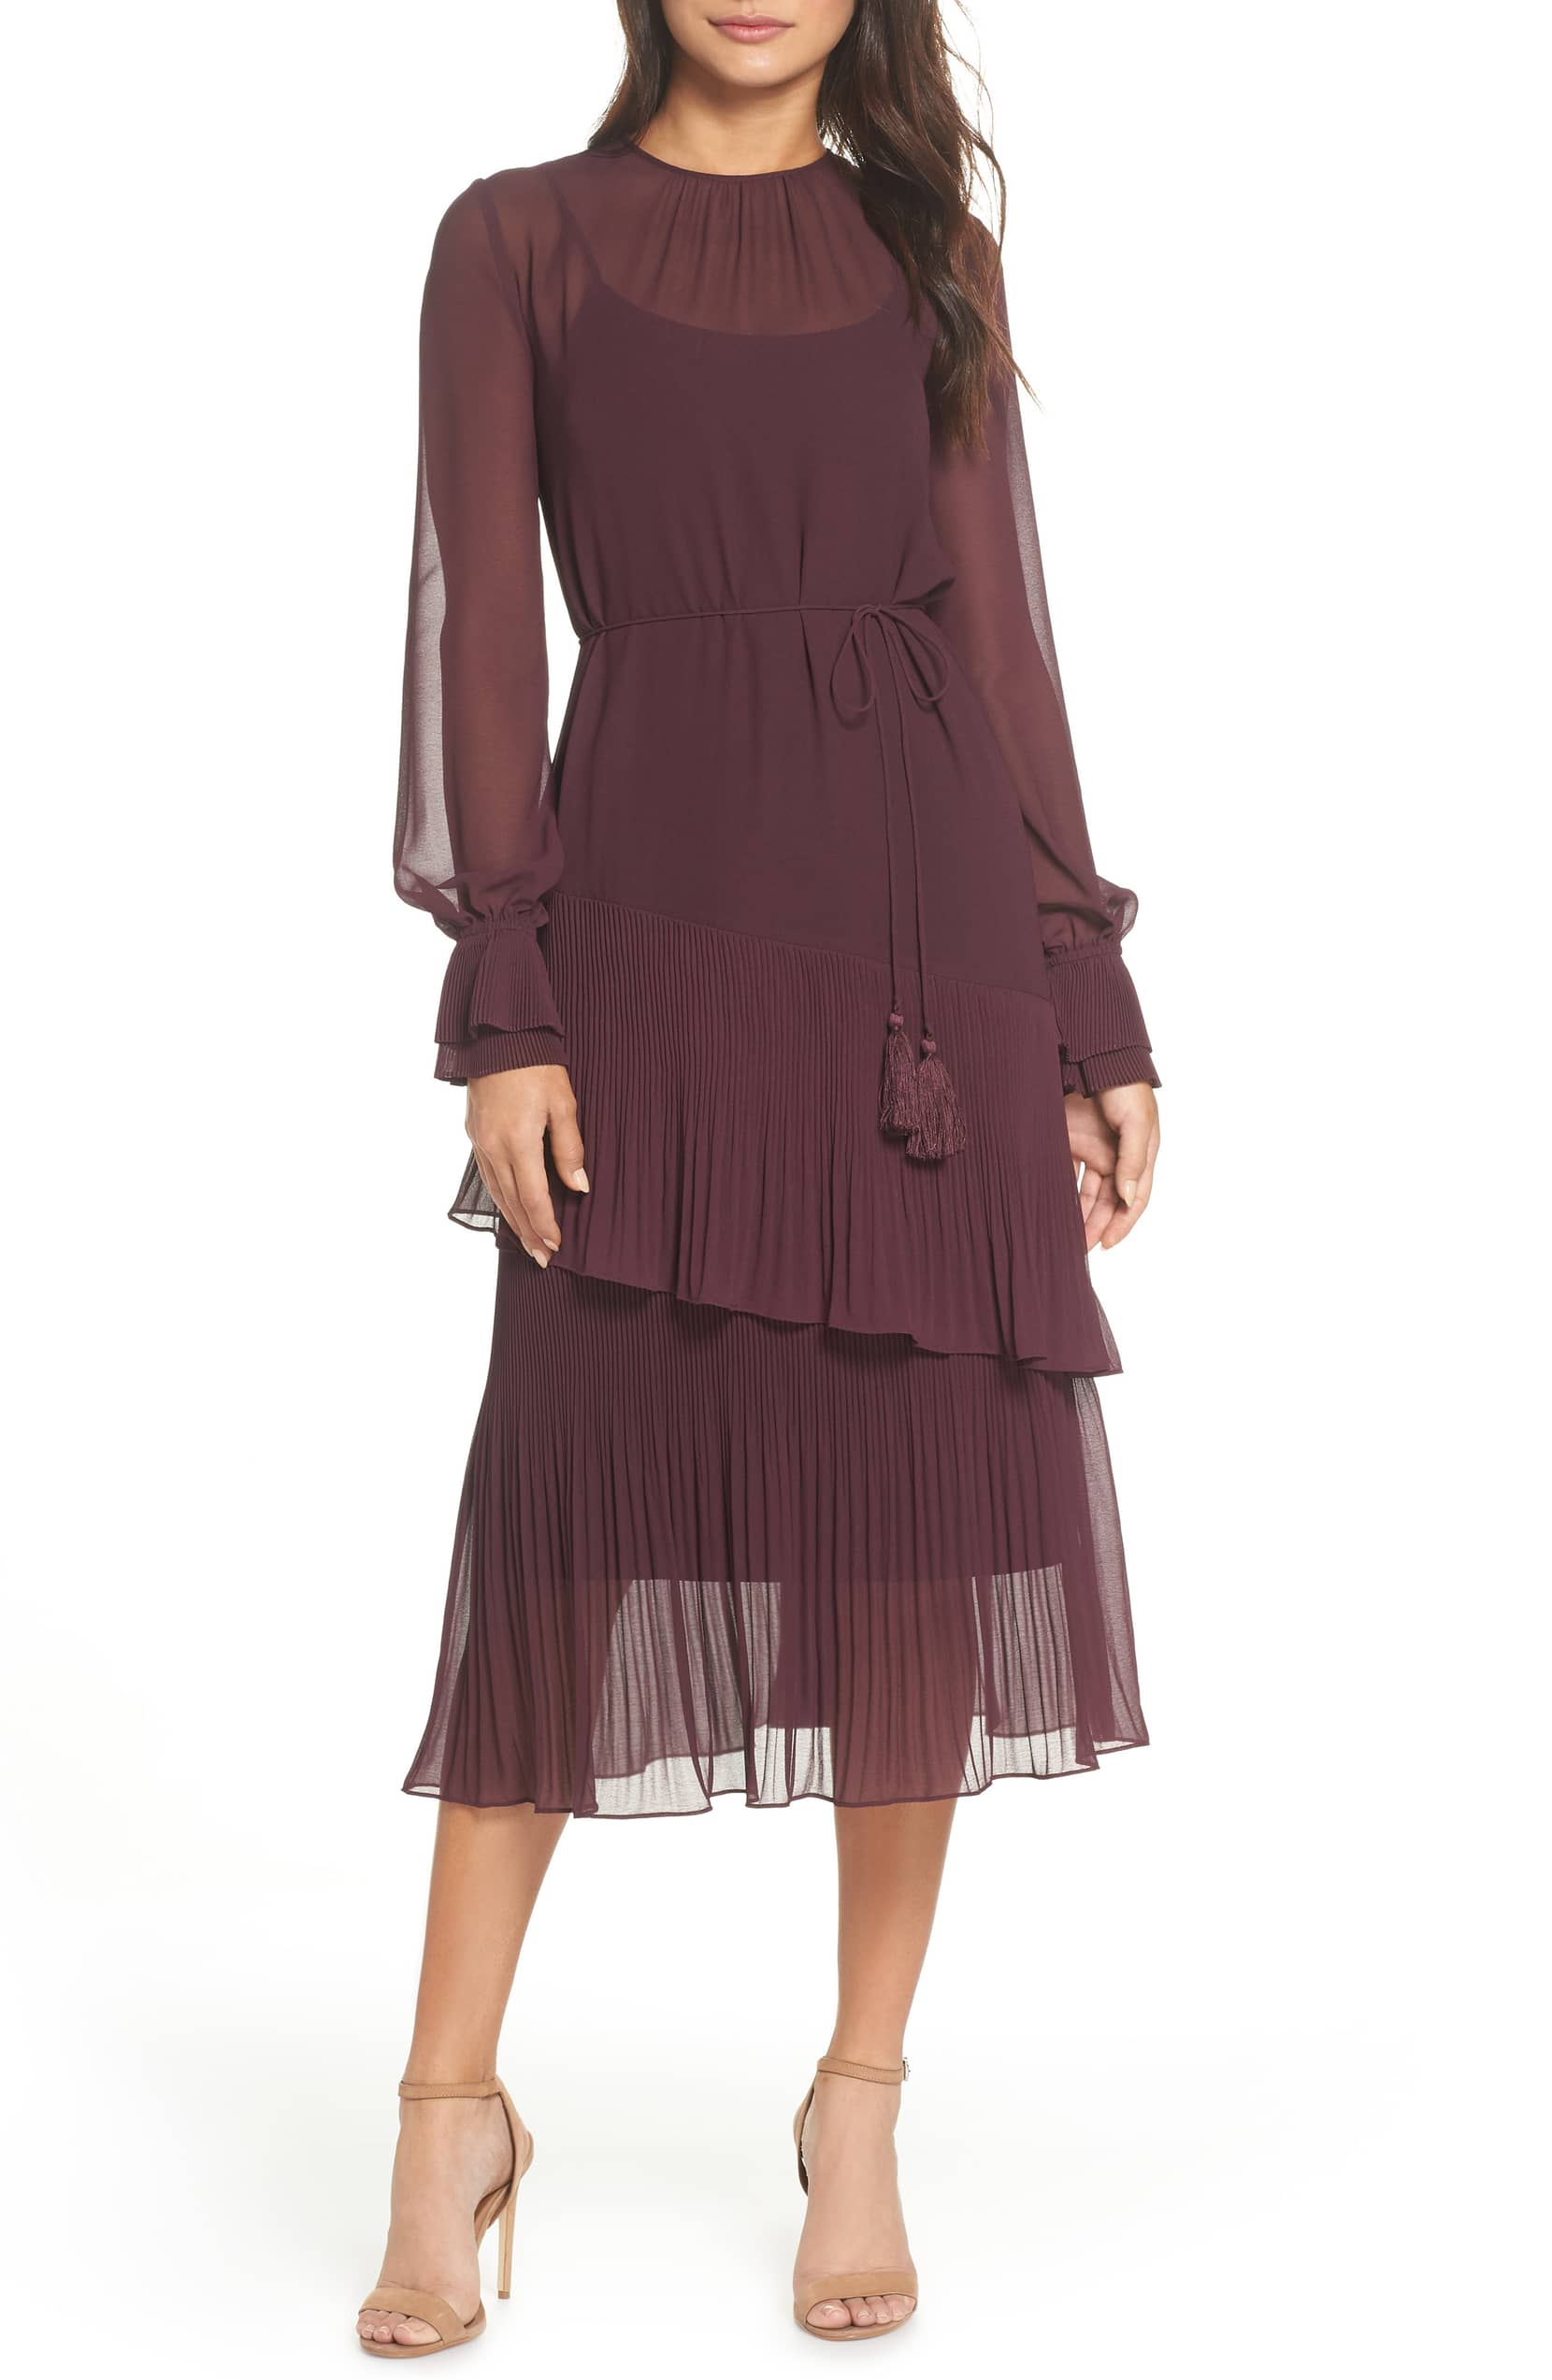 4d6c05028 CHELSEA28 Pleat Detail Midi Burgundy Dress - We Select Dresses